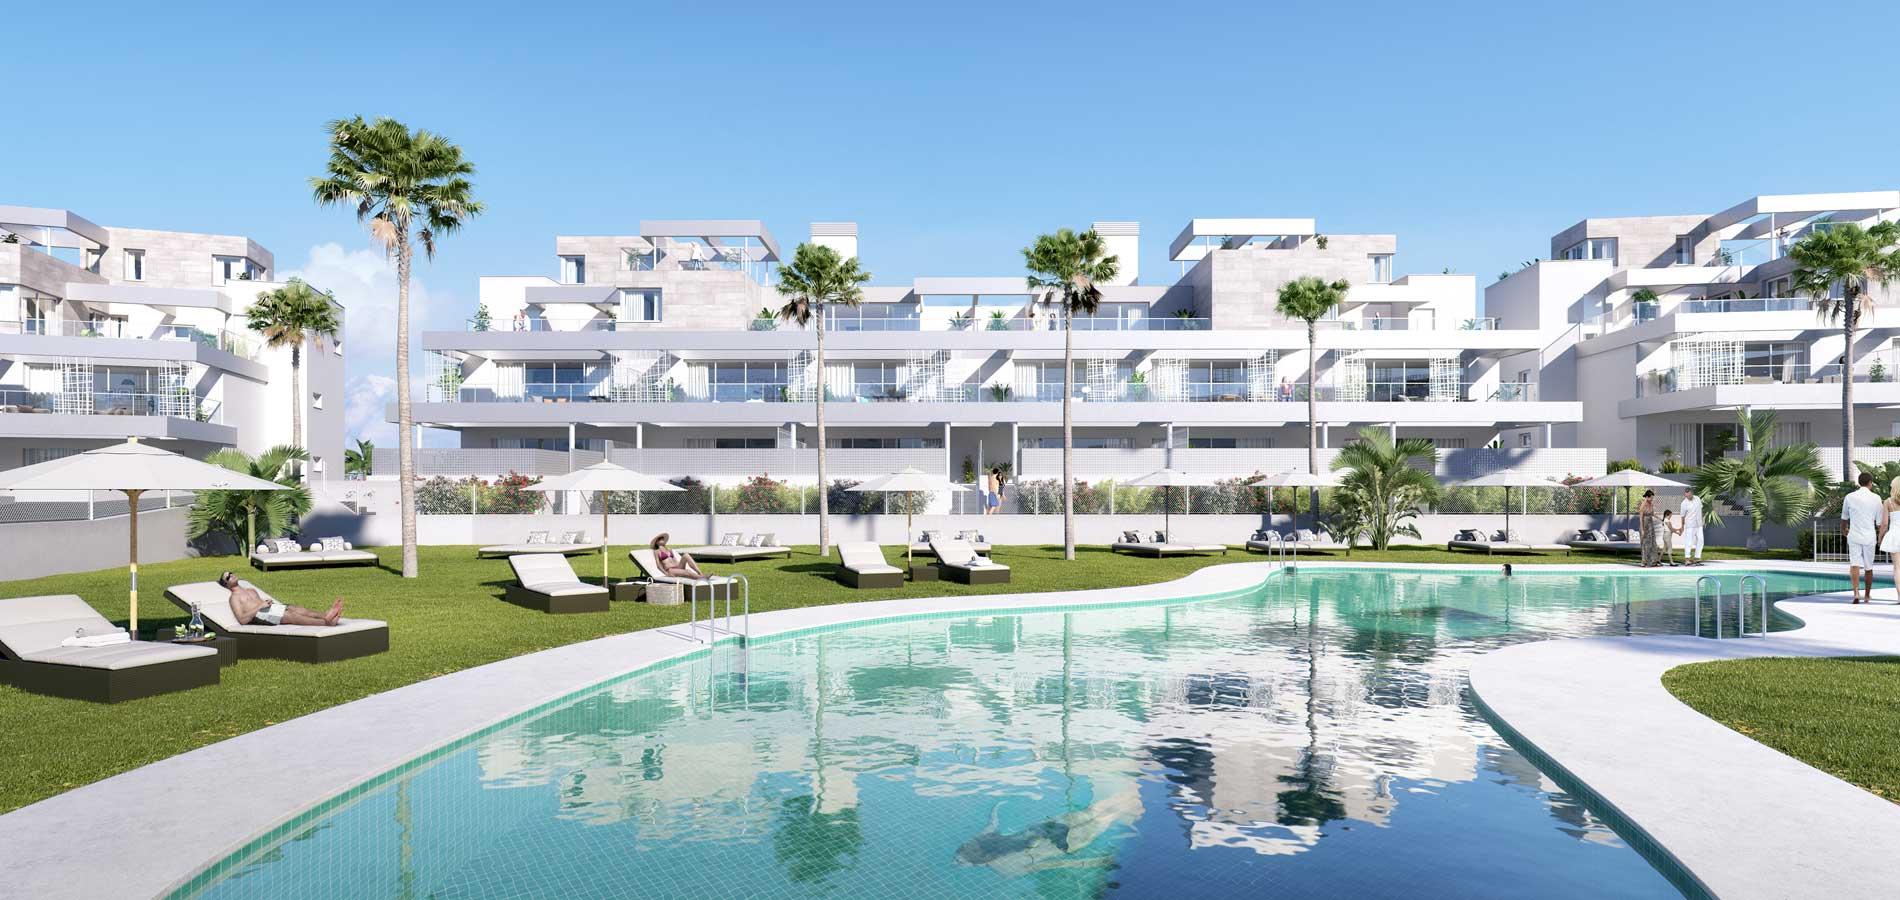 sense village golf cancelada nieuwbouw bankbeslag zee new golden mile zwembad